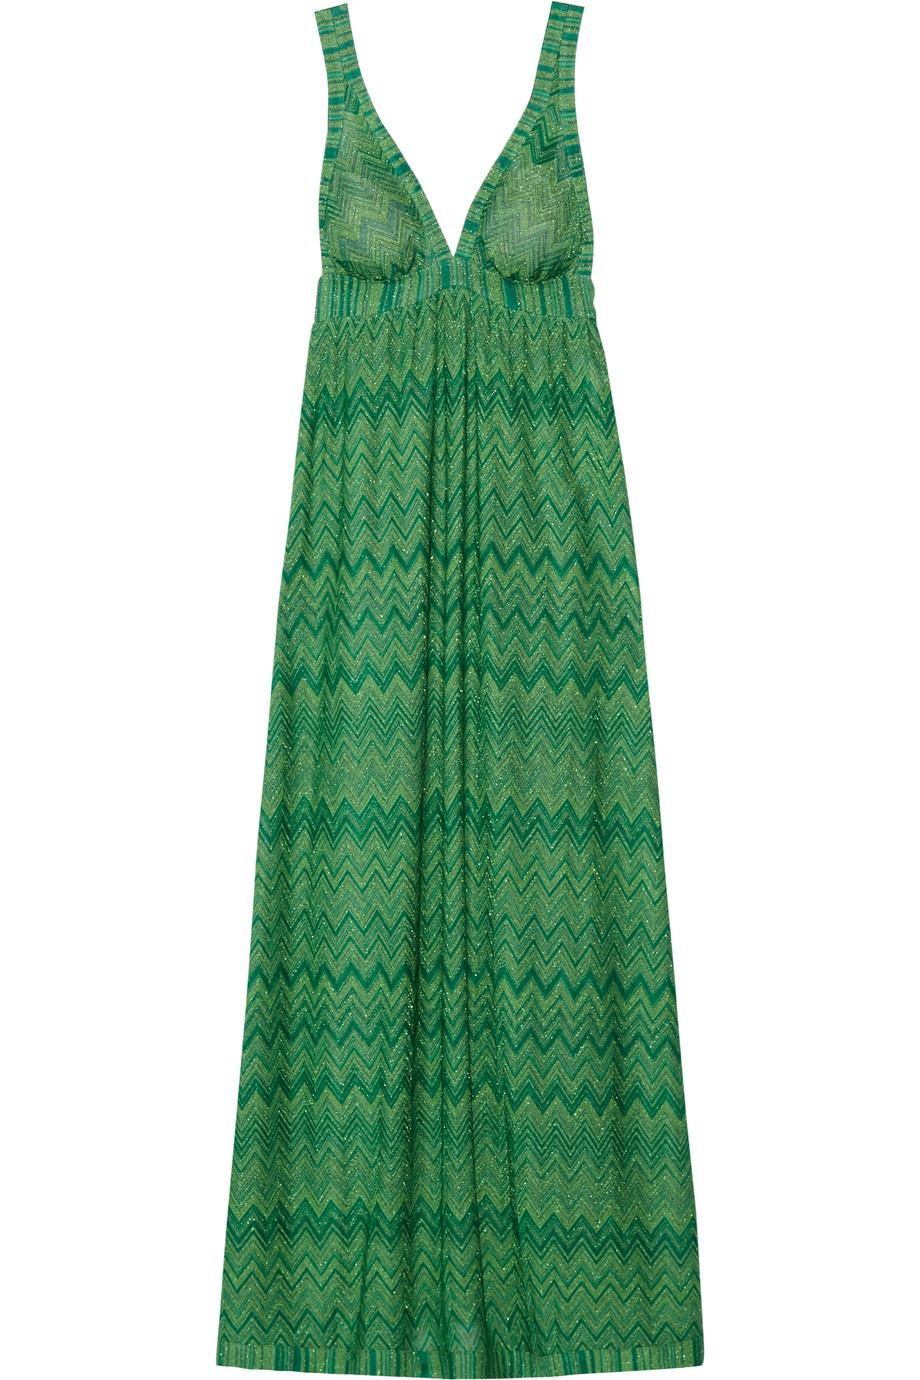 Missoni Mare Crochet-Knit Maxi Dress, Bright Green, Women's - Metallic, Size: 40